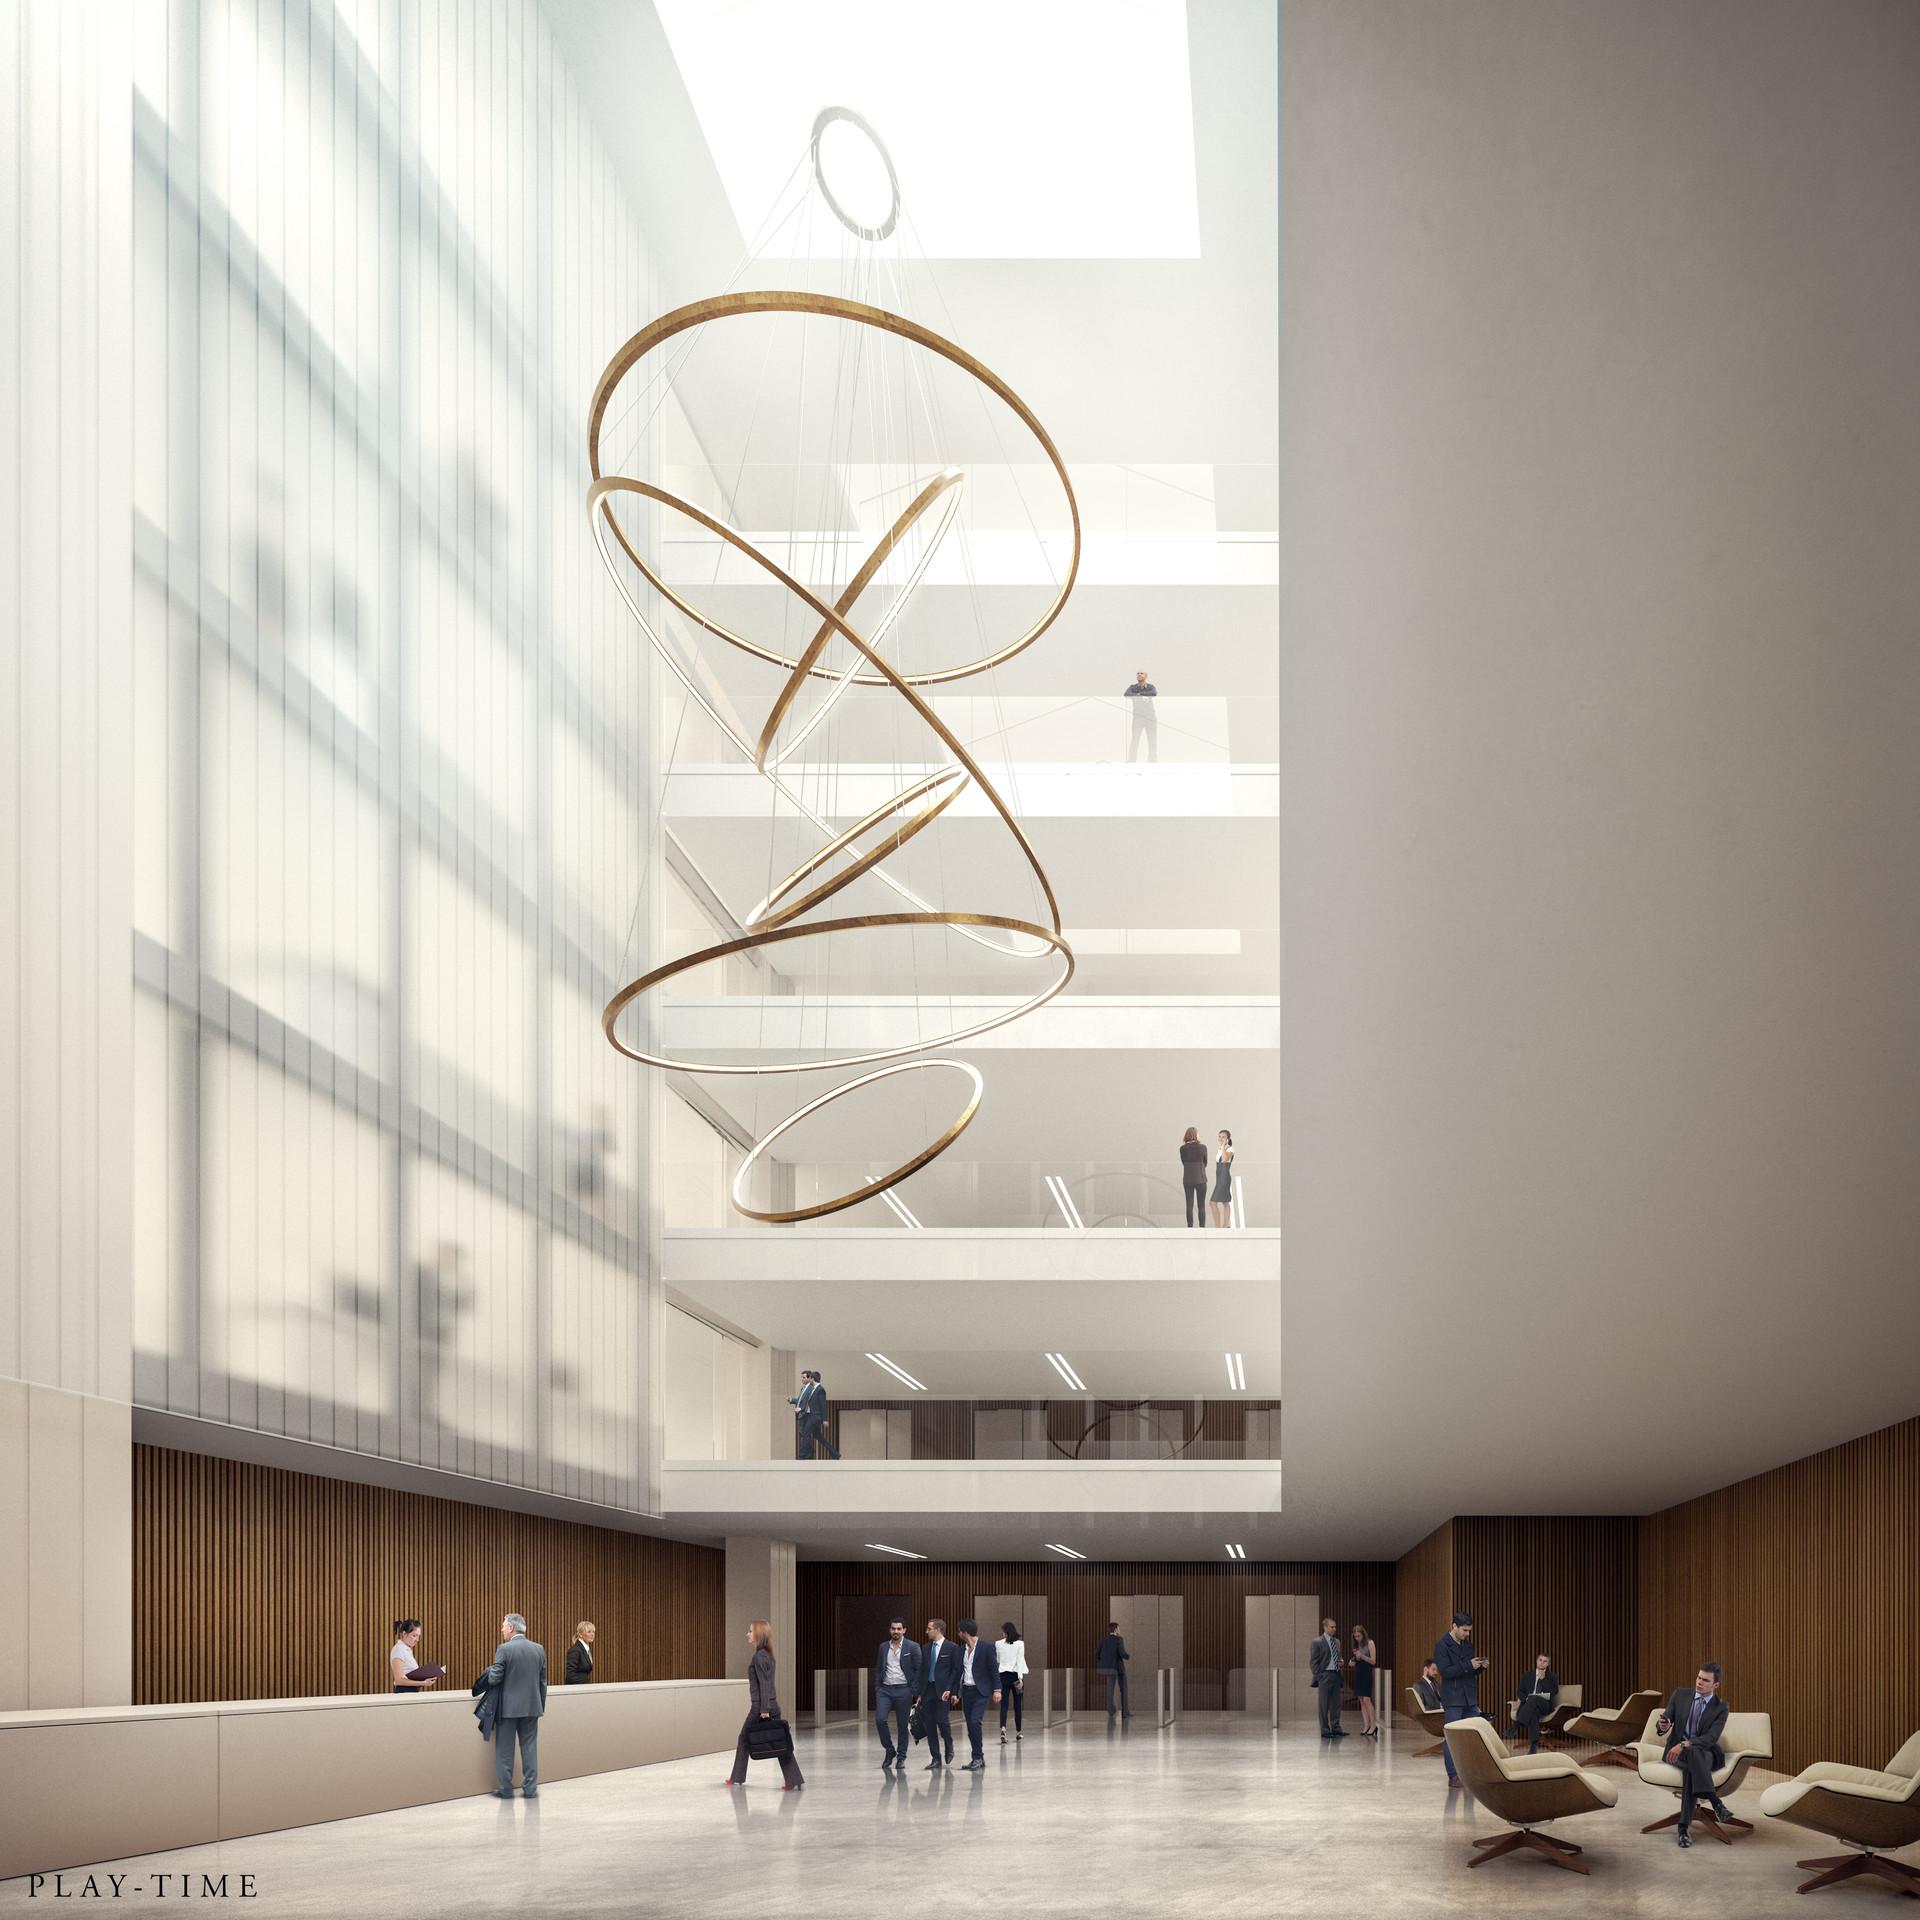 Play time architectonic image rdaa concurso rehabilitacion bureaux france 01